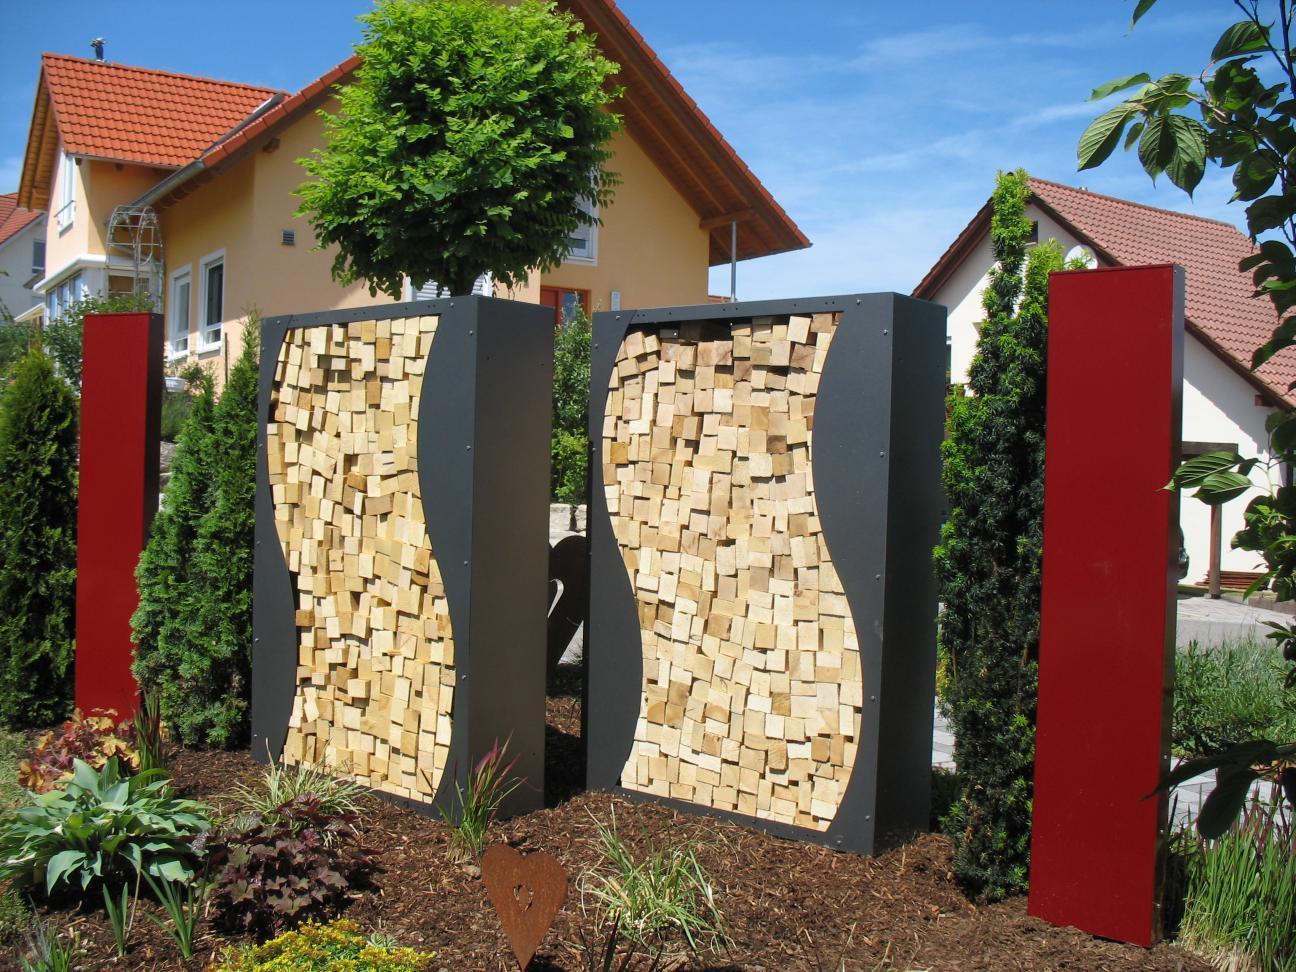 kaminholzregal metall 1 7m x 1 0 m farbe nach ral karte. Black Bedroom Furniture Sets. Home Design Ideas